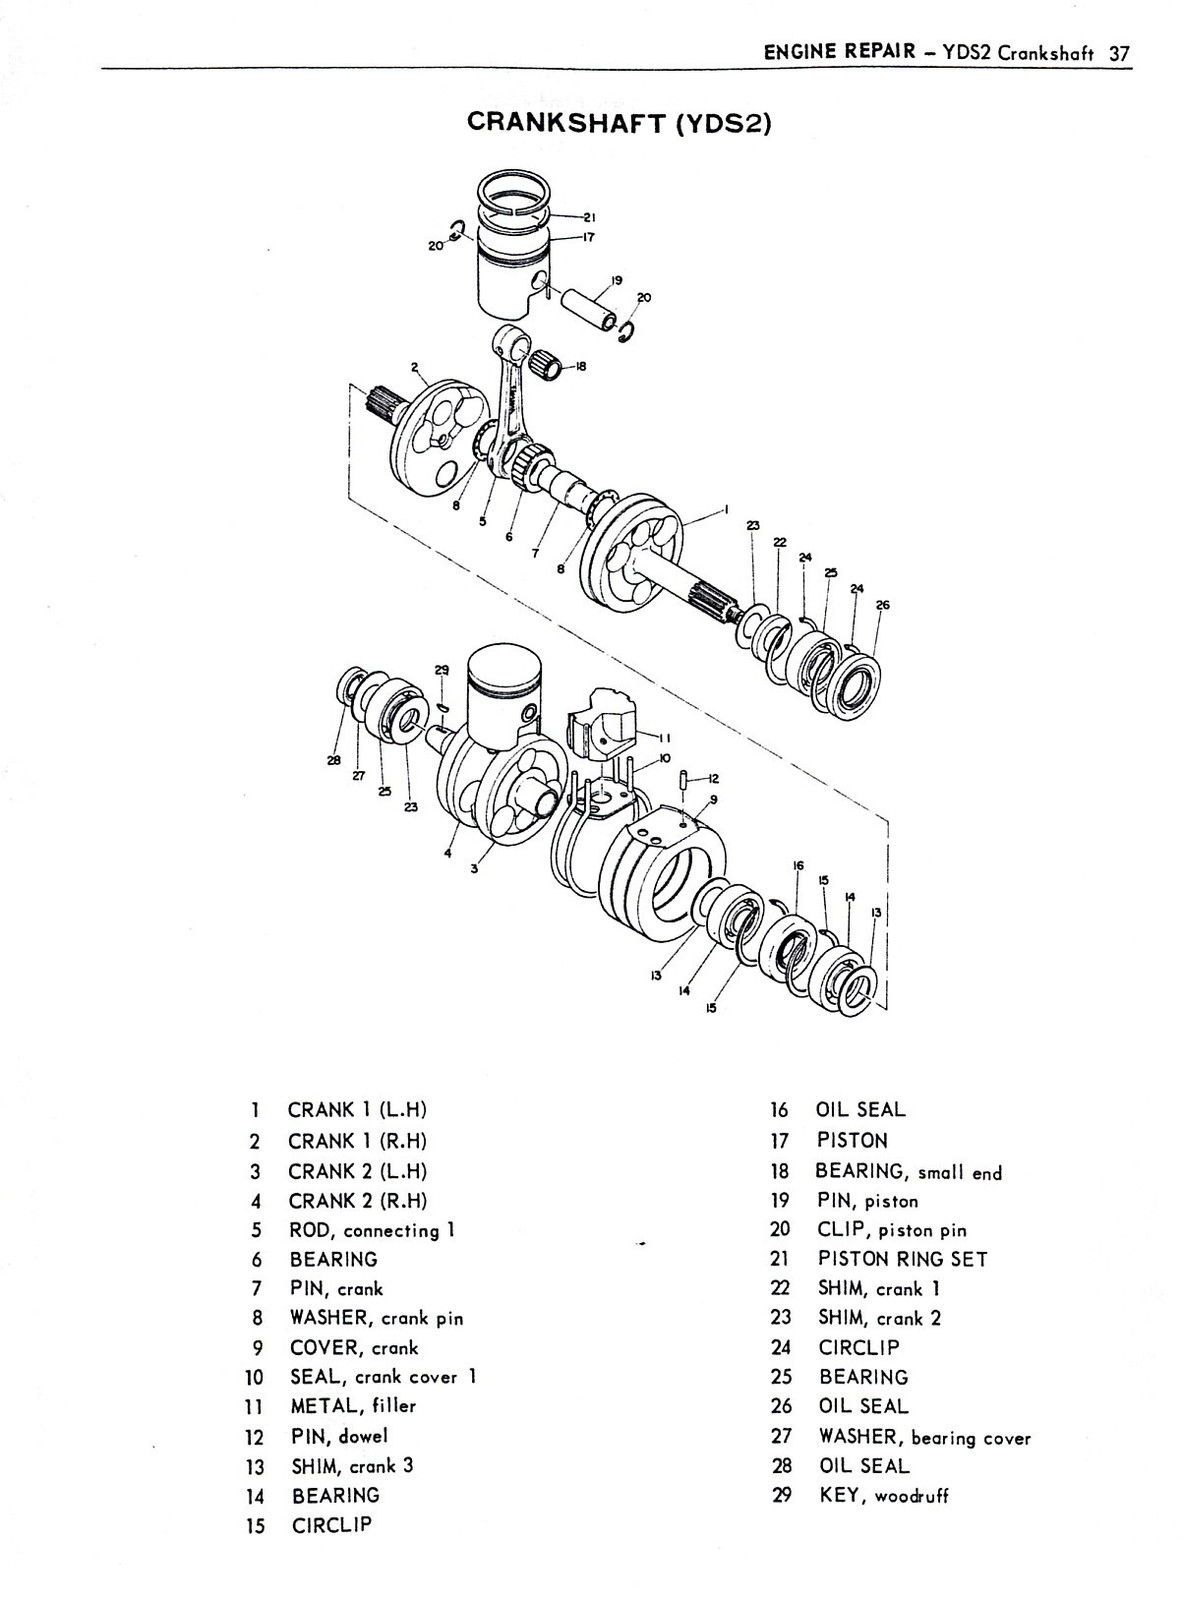 hight resolution of 1962 1966 250 305 yamaha twins service manual ym1 yd3 yds2 yds3c vjmc yd2 yds1 ebay